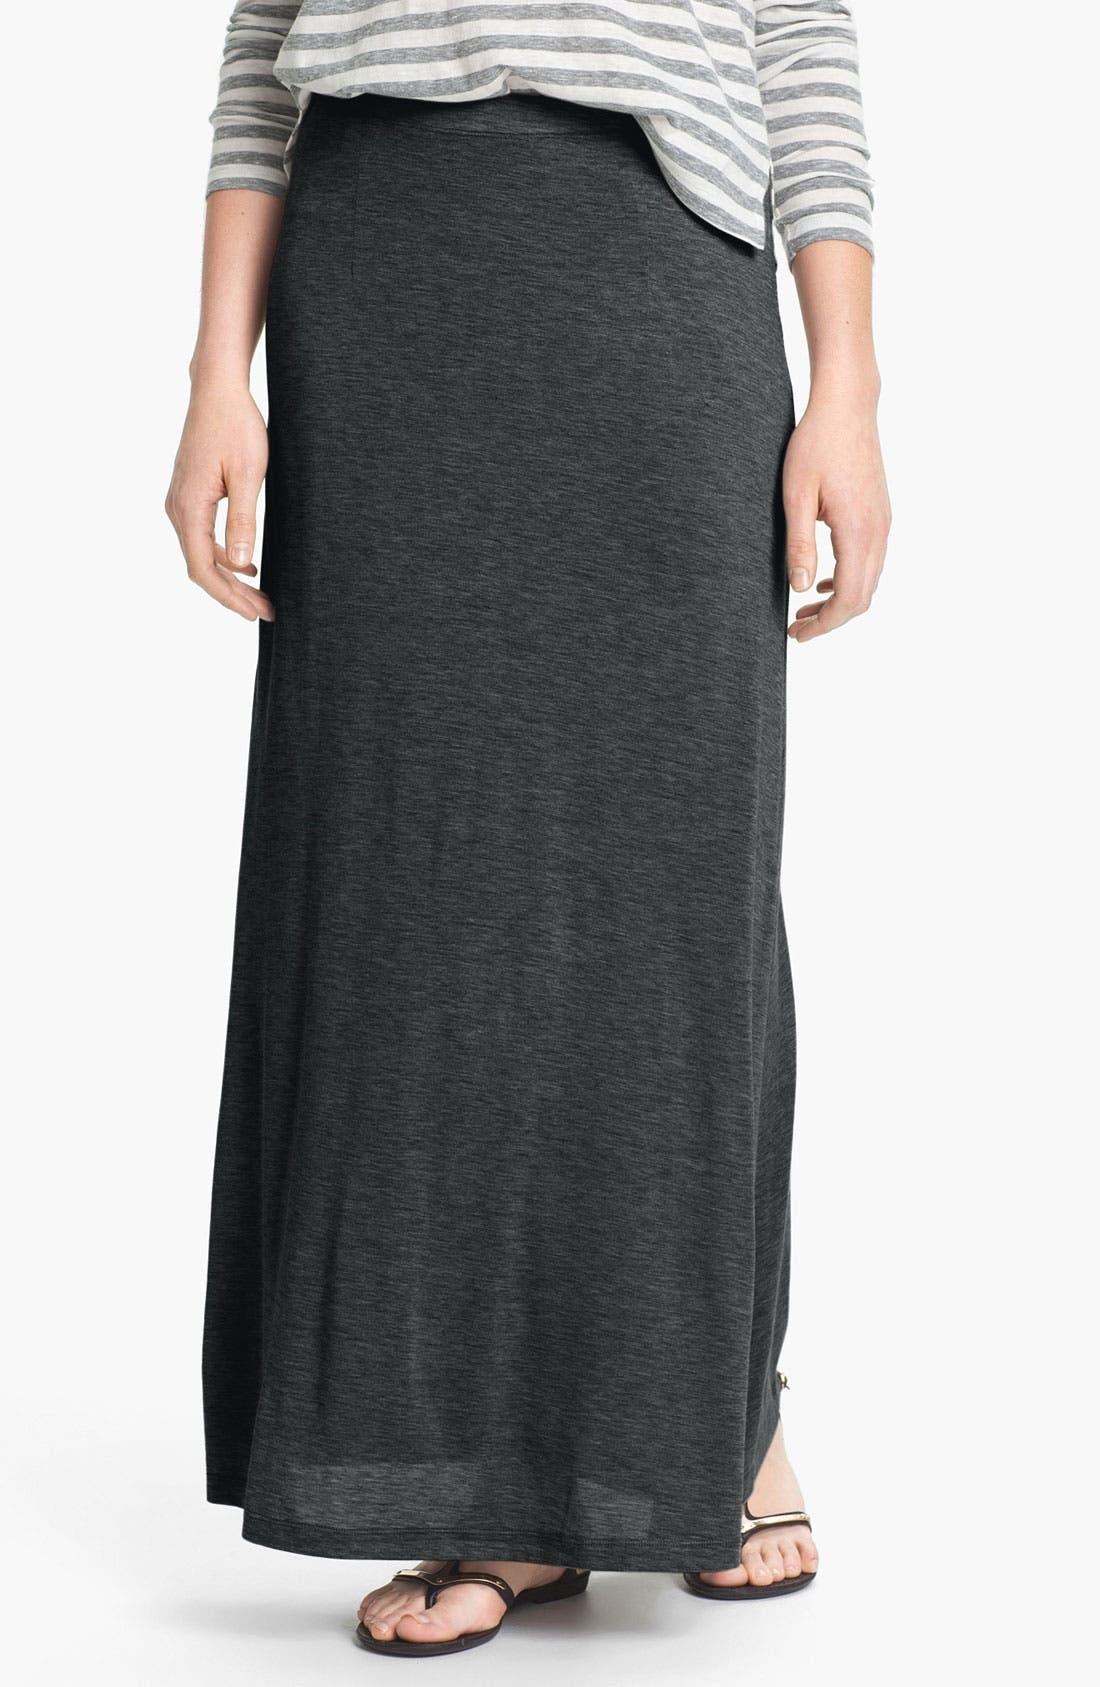 EILEEN FISHER,                             Silk & Cotton Jersey Maxi Skirt,                             Main thumbnail 1, color,                             025